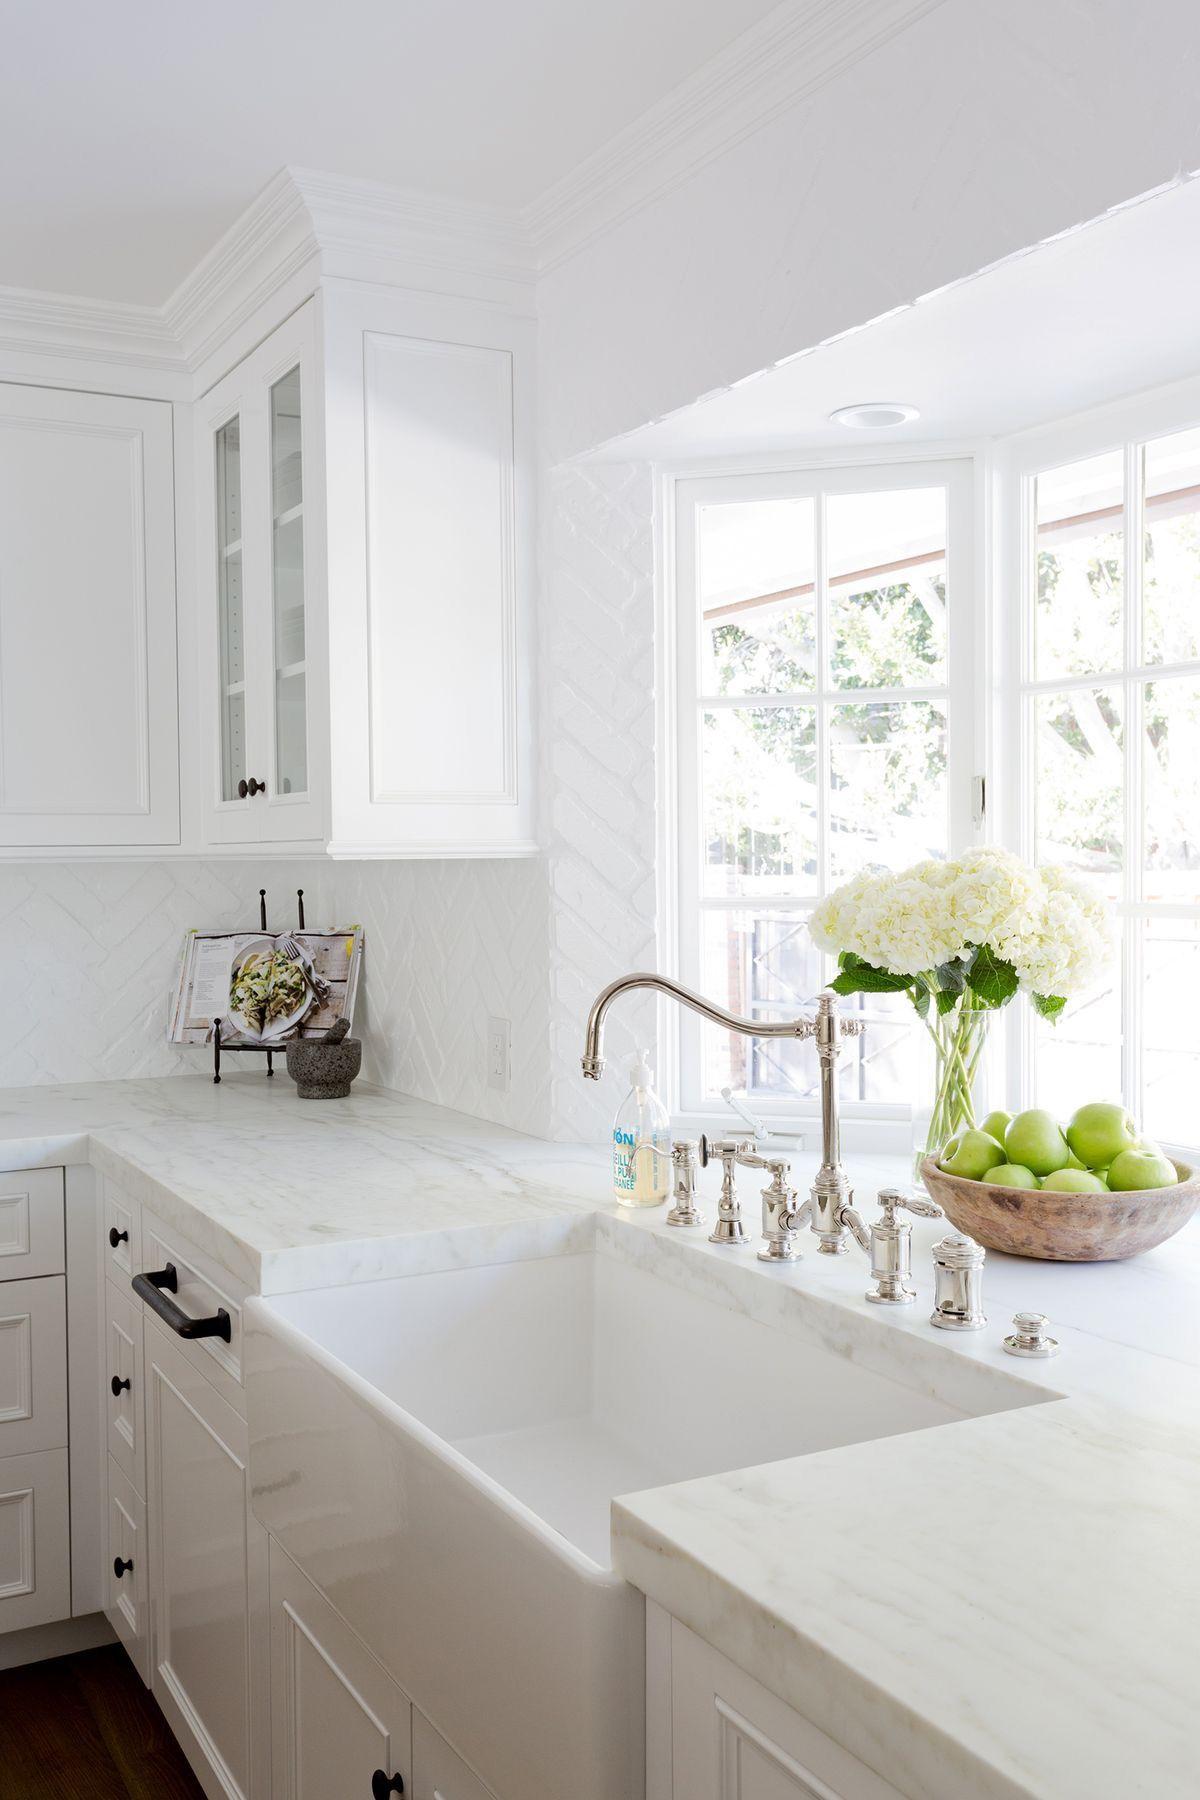 Kitchen sink window decor  bay window for plants  home sweet home  pinterest  window